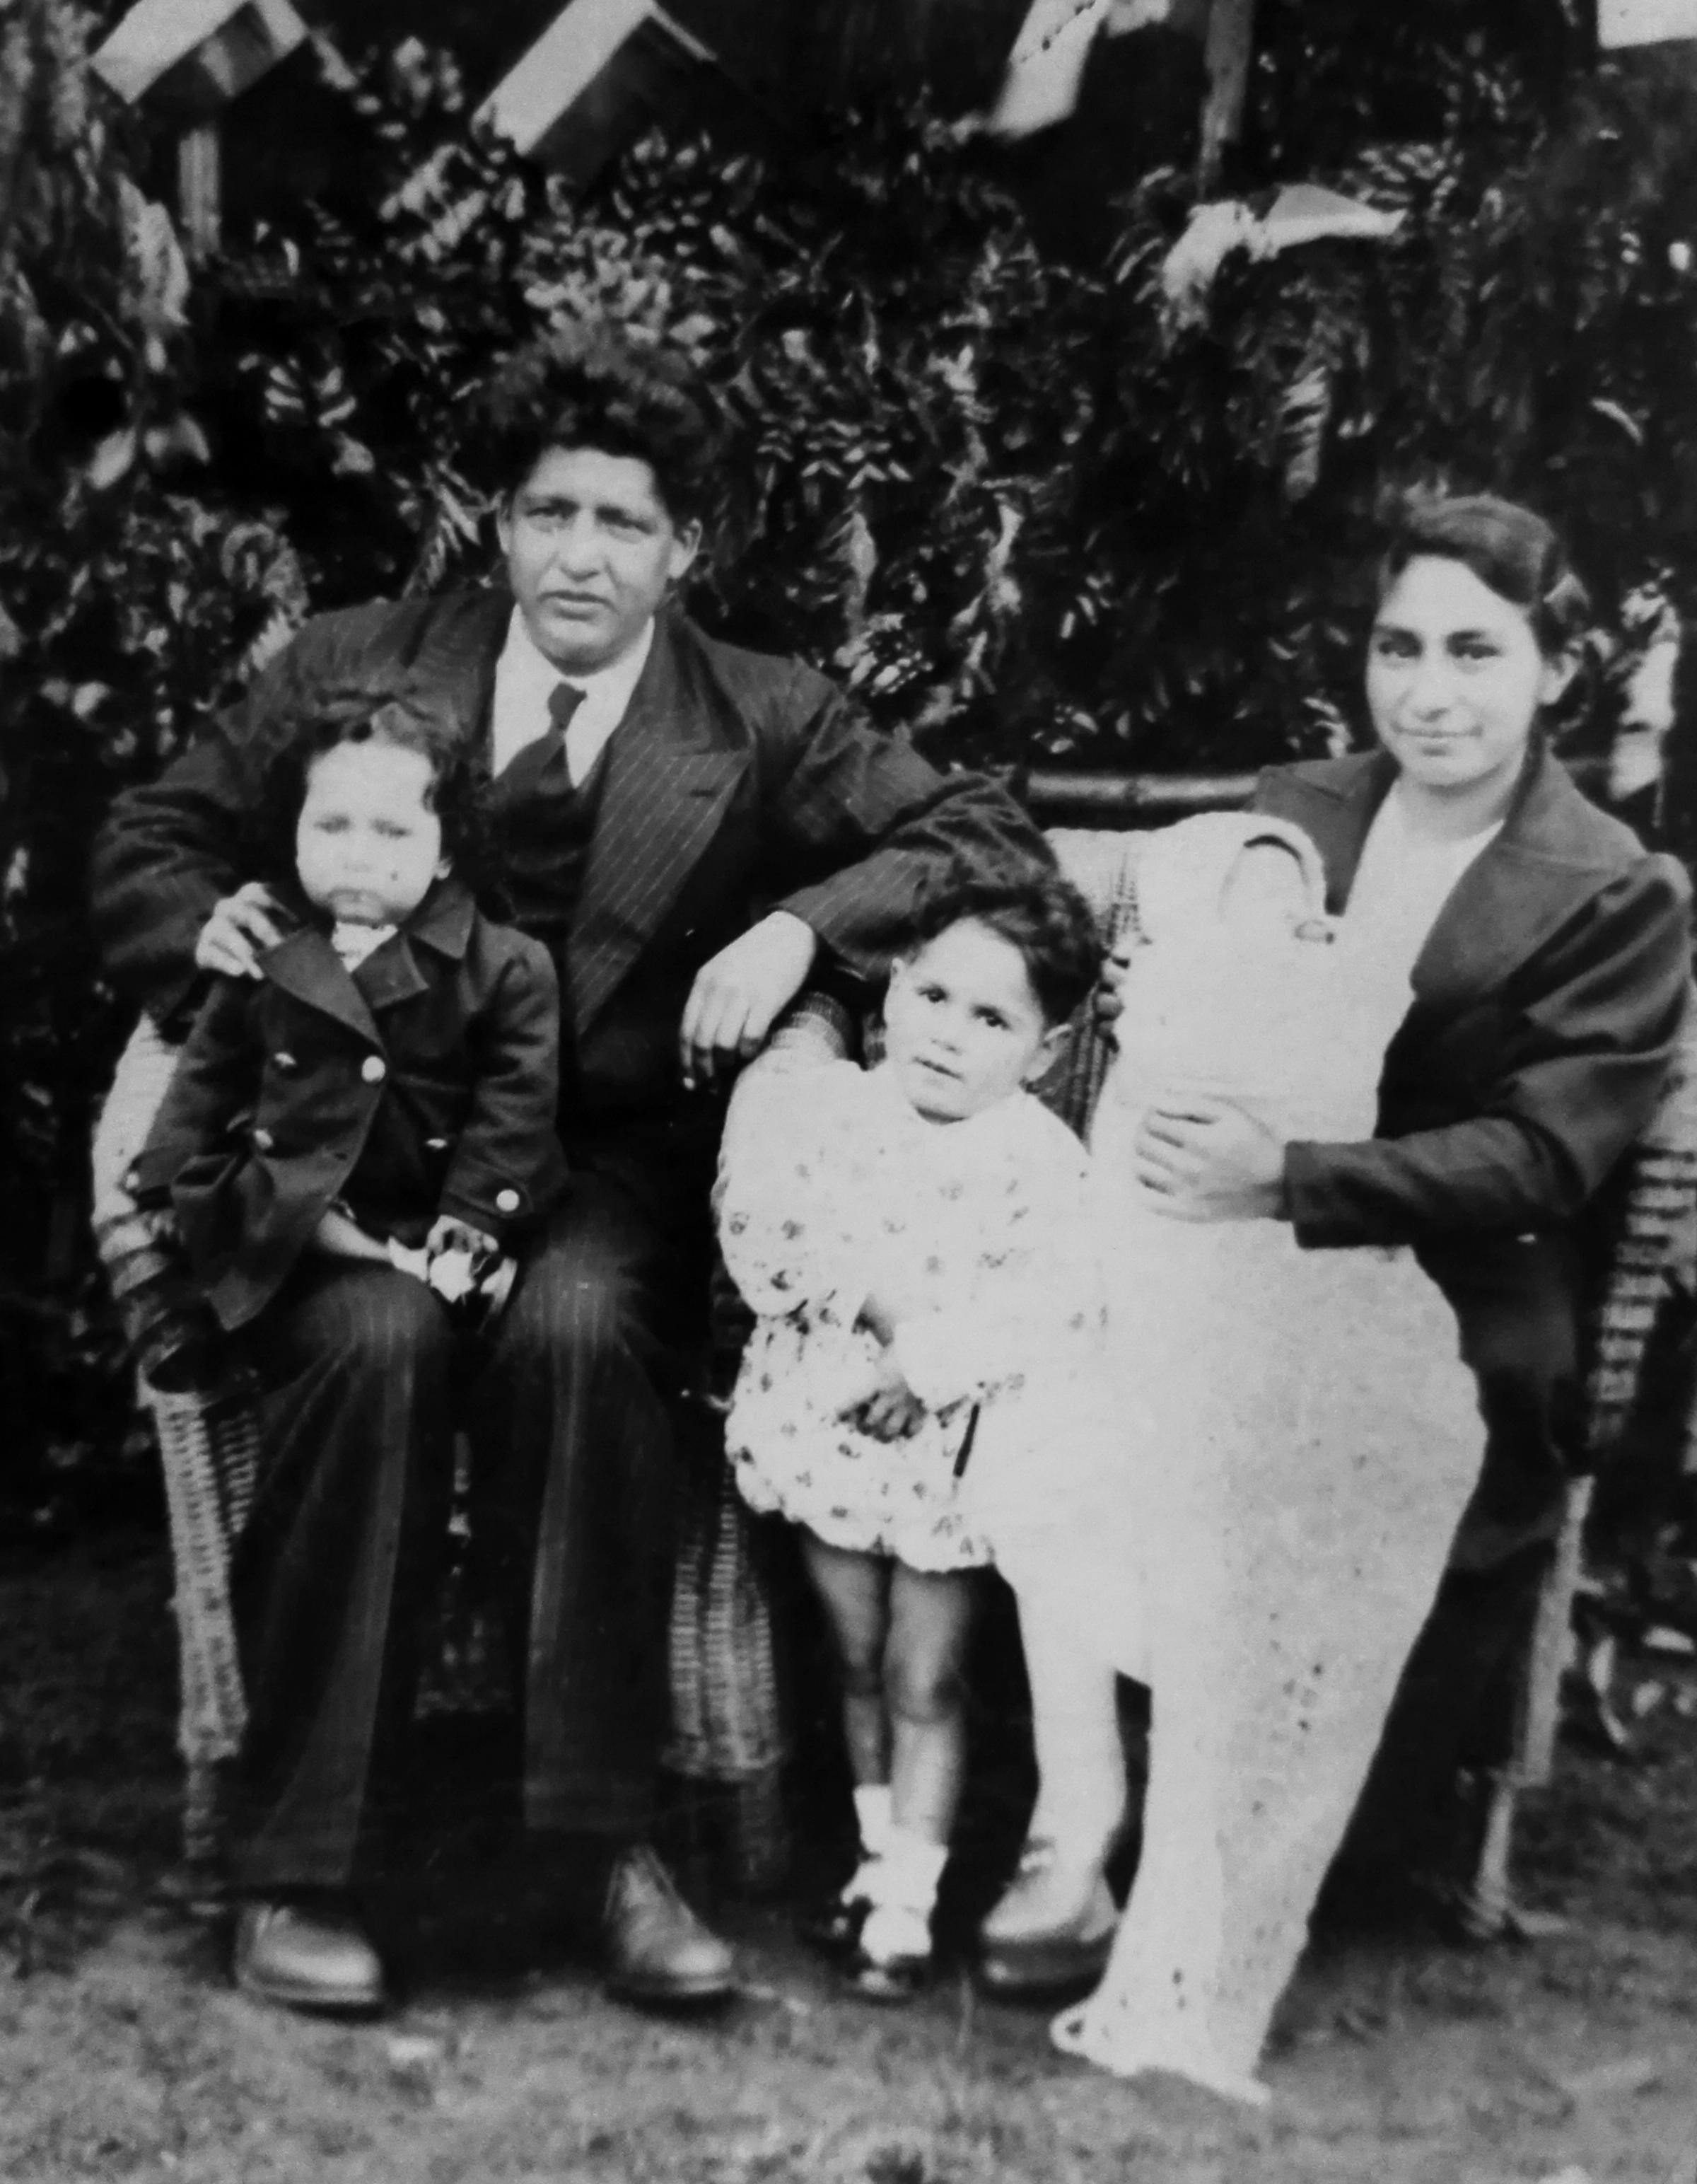 Enterreno - Fotos históricas de chile - fotos antiguas de Chile - Familia Mercado Tapia, Temuco, 1942